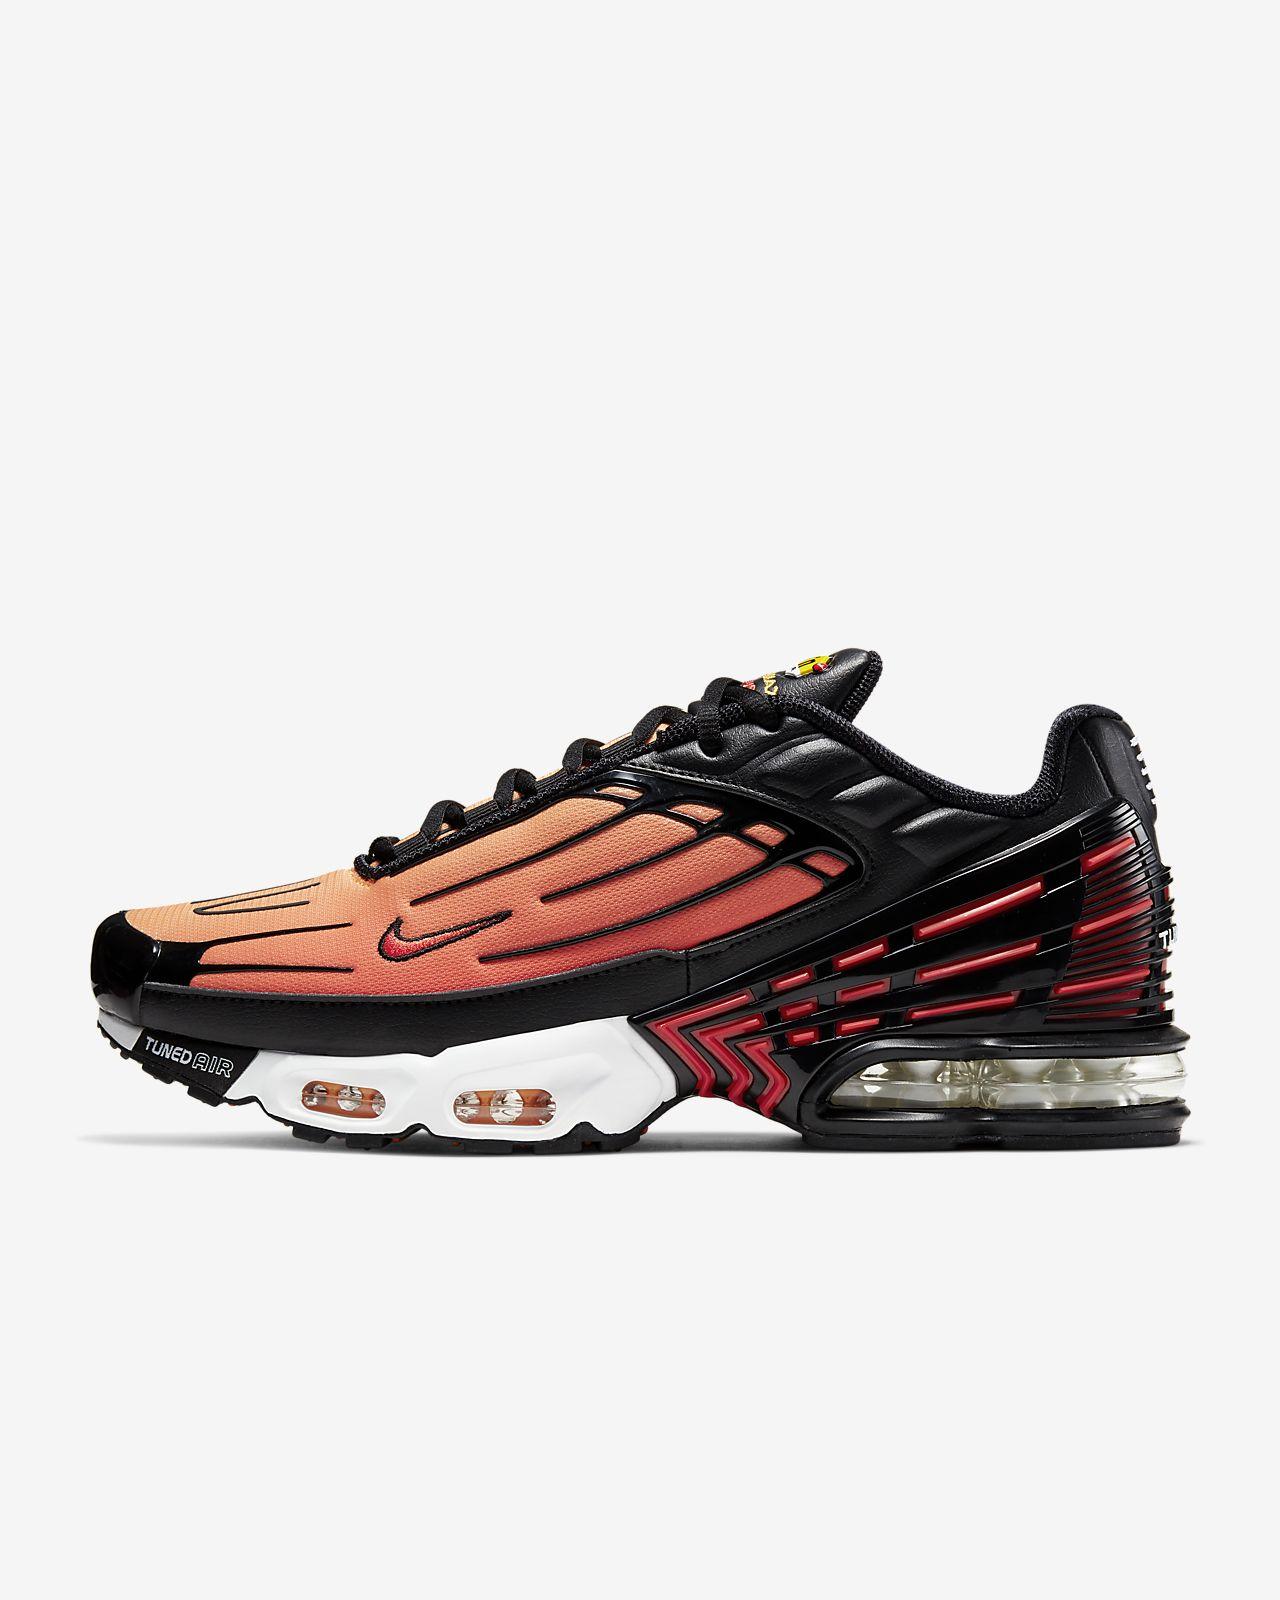 Mænd Air Max 97 Sko. Nike DK